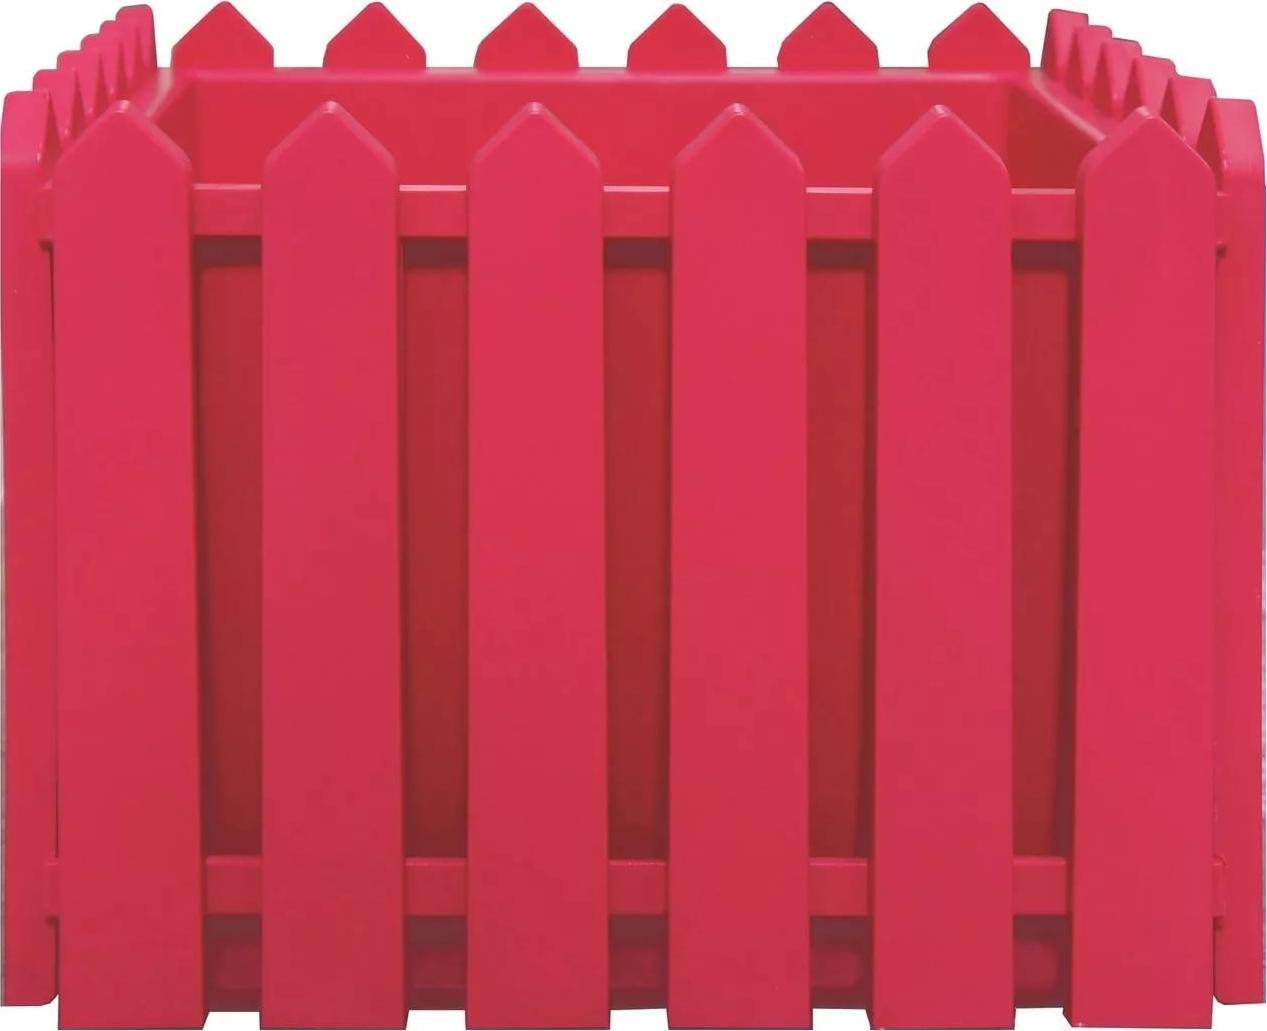 Кашпо Элластик-Пласт Лардо, ЭП 205852, красный, 28 х 28 х 22 см цена